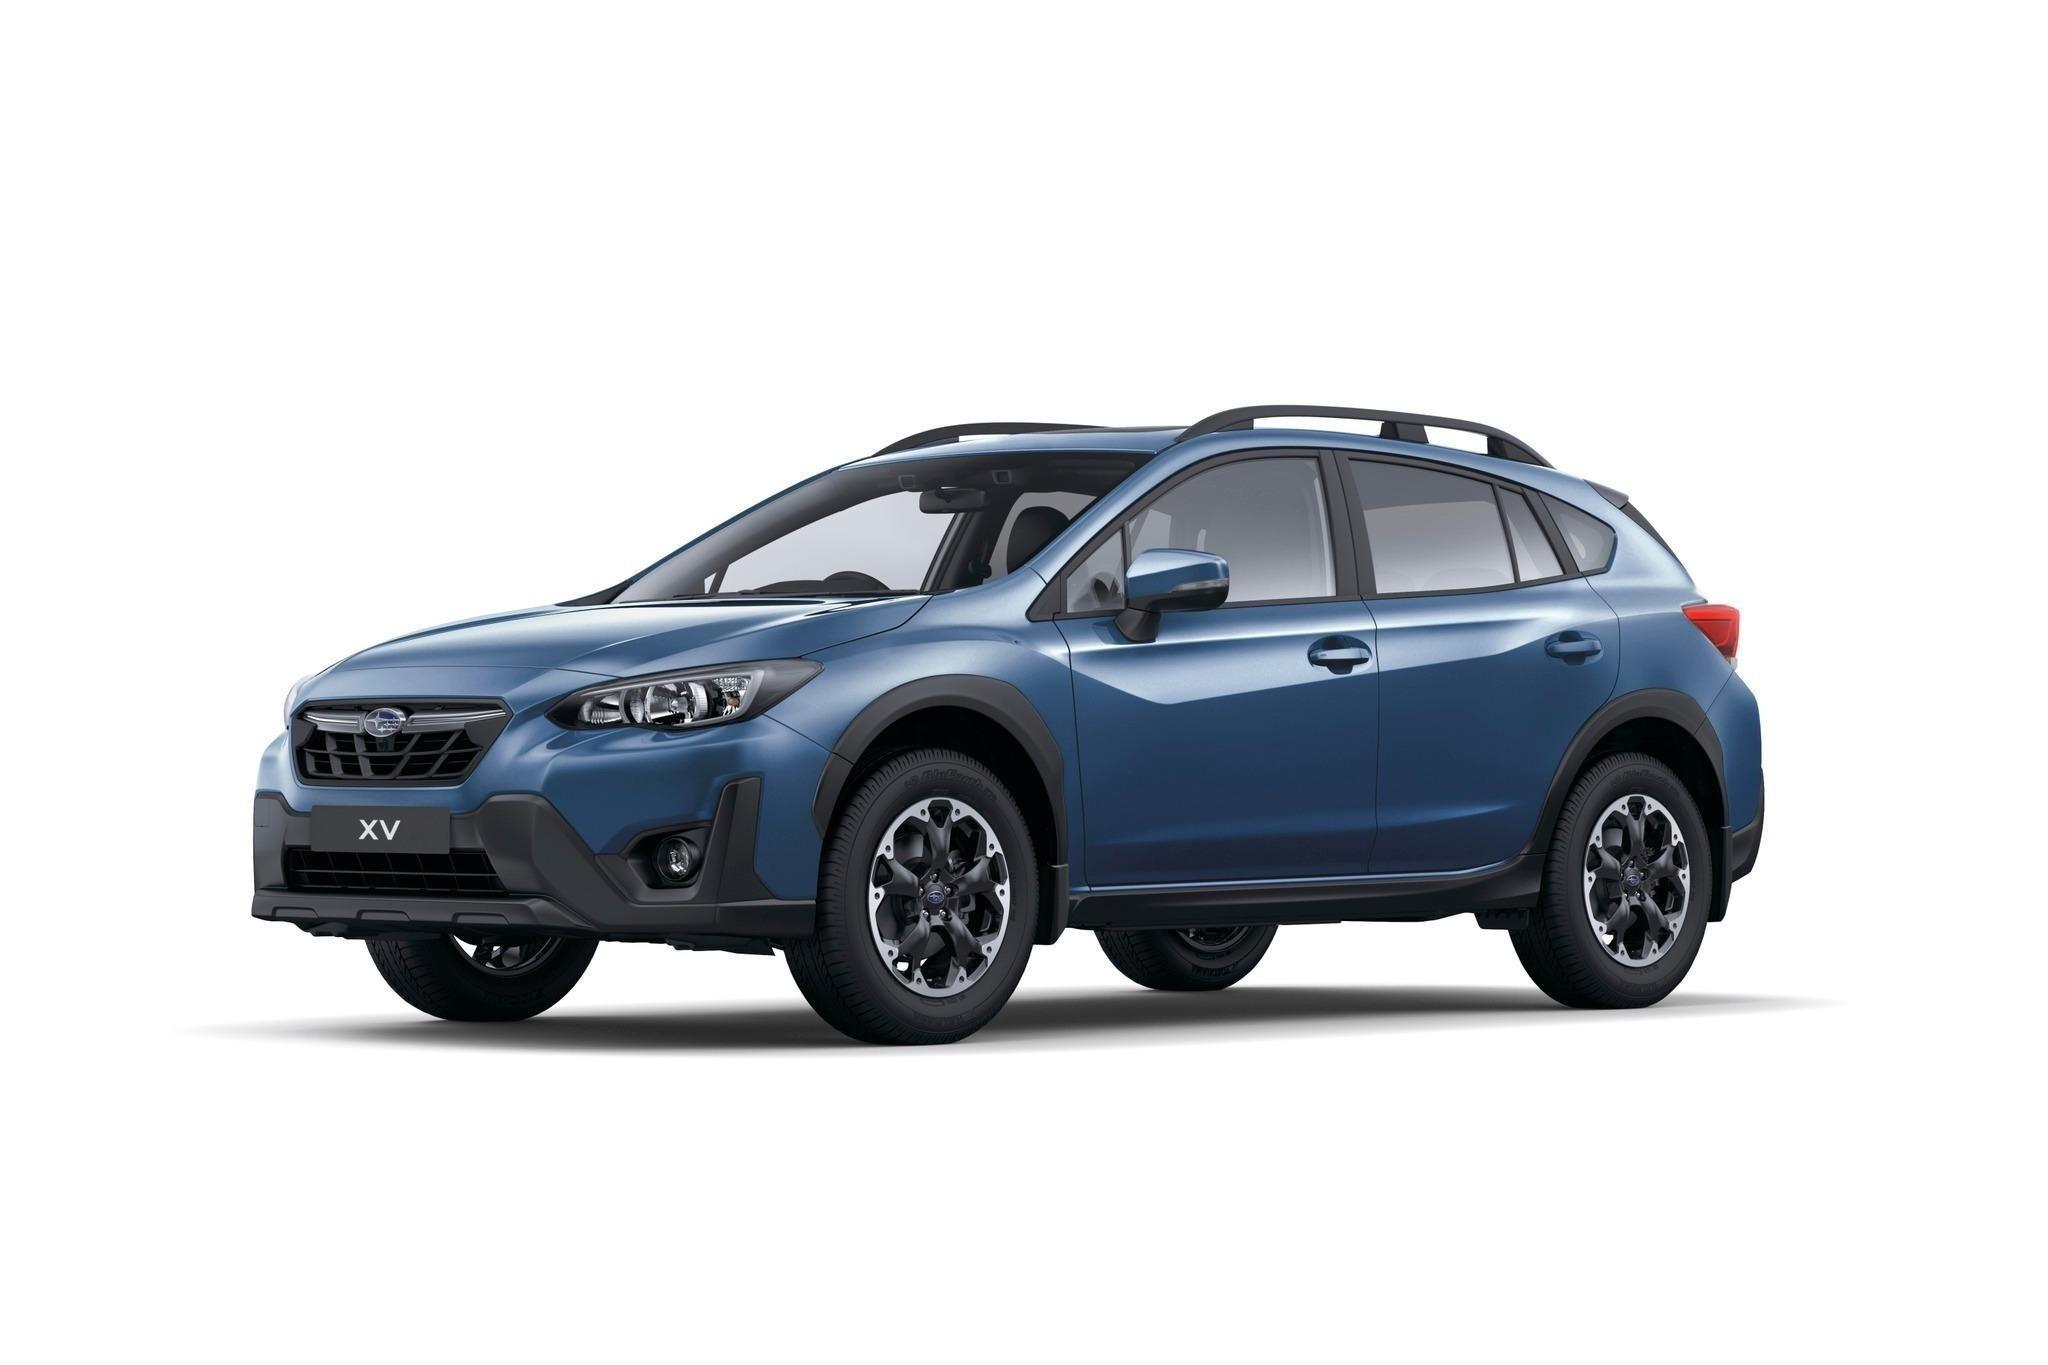 2021 Subaru XV 2.0i PREMIUM AWD MY21 / Automatic (CVT) / Wagon / 2.0L / 4 Cylinder / Petrol / 4x4 / 4 door / Model Year '21 October release 08J121